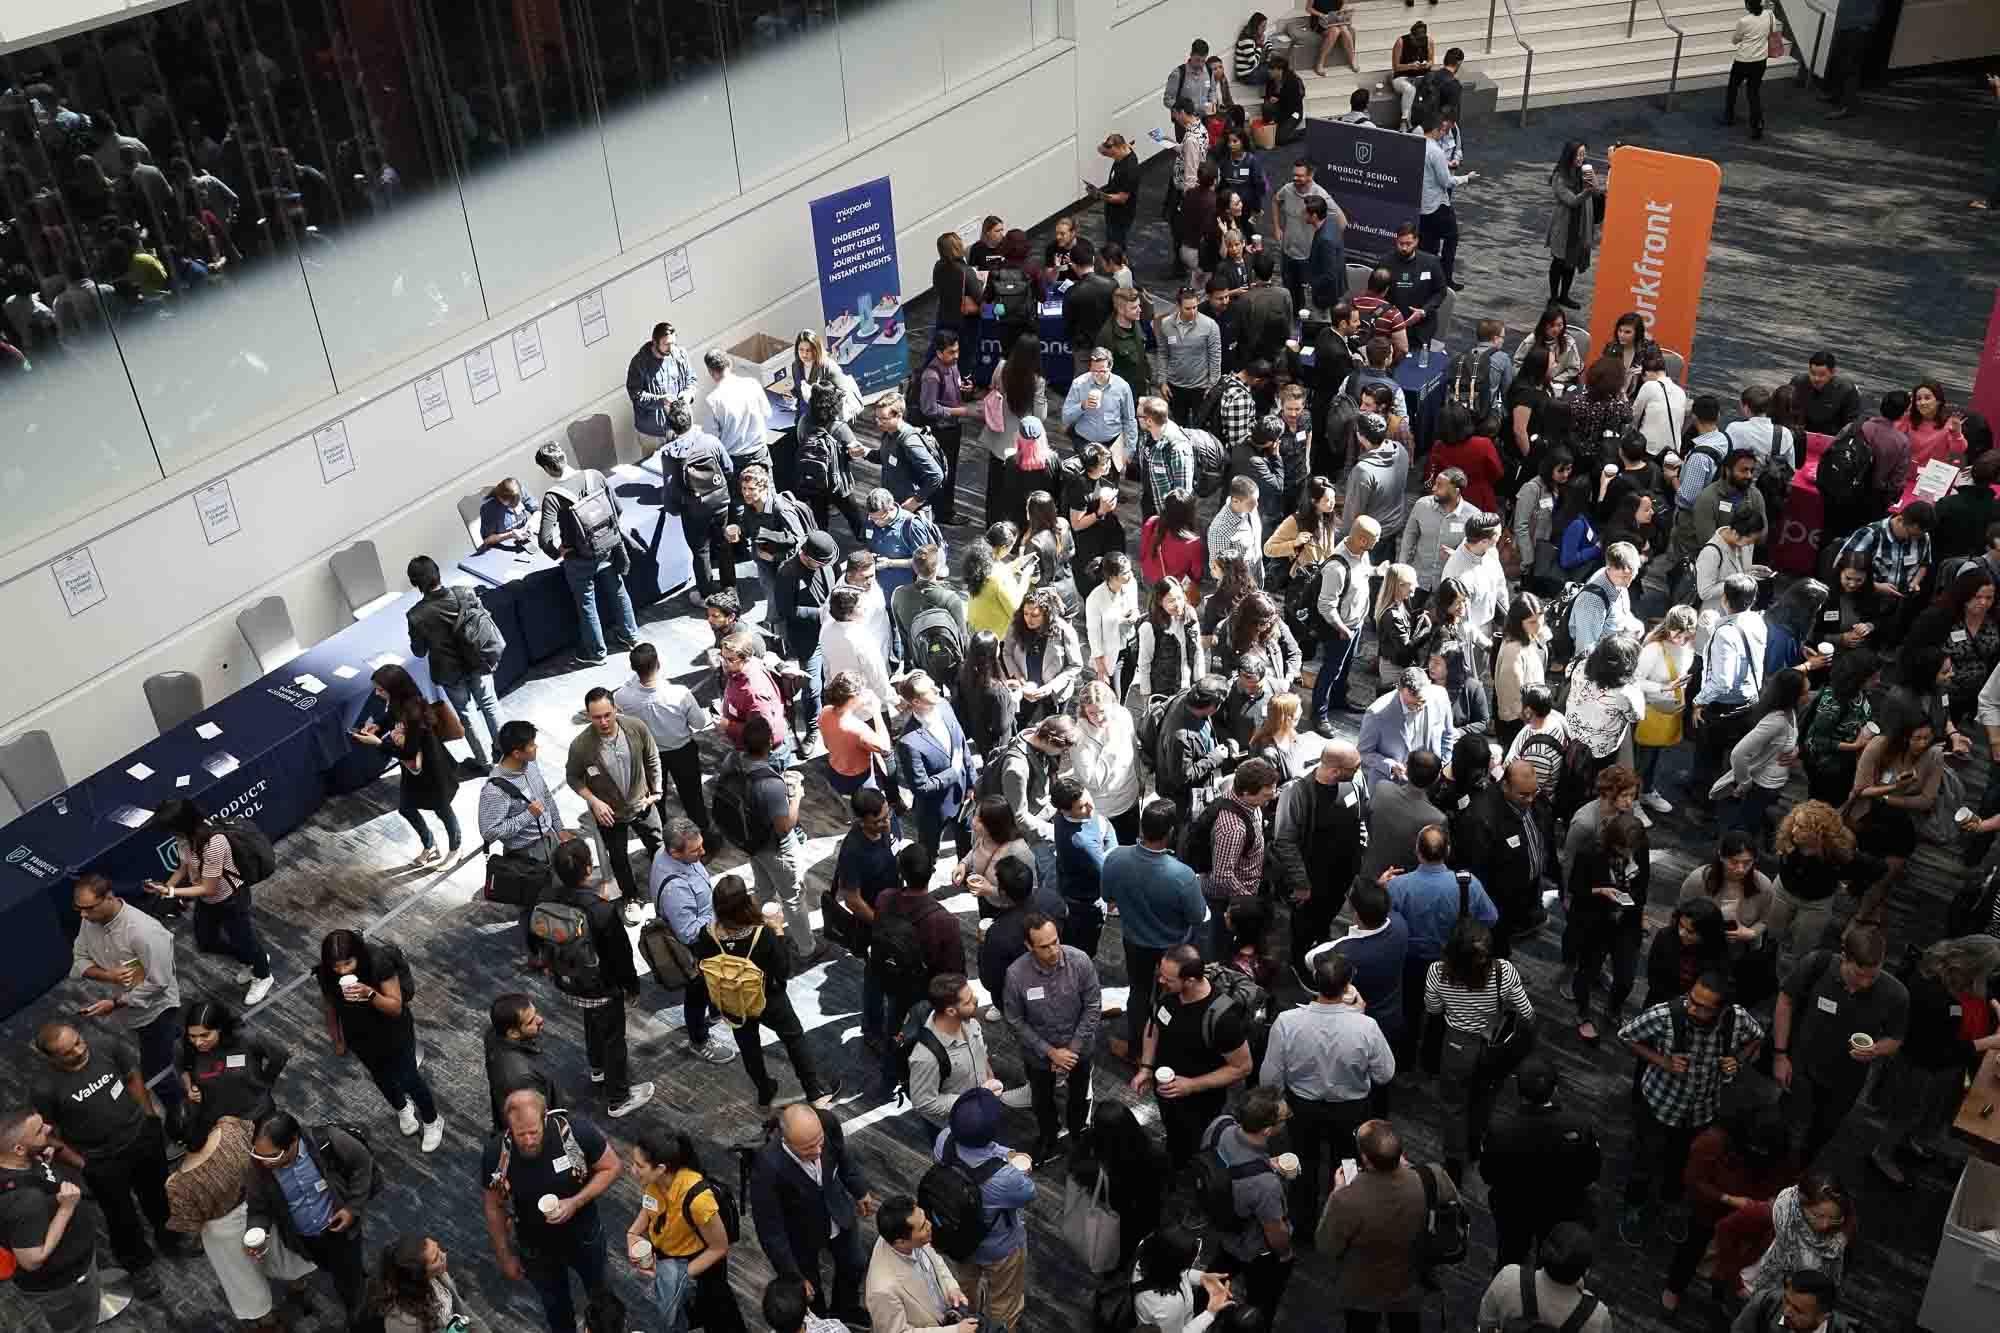 Professionell organisierte Events mit breitem Publikum